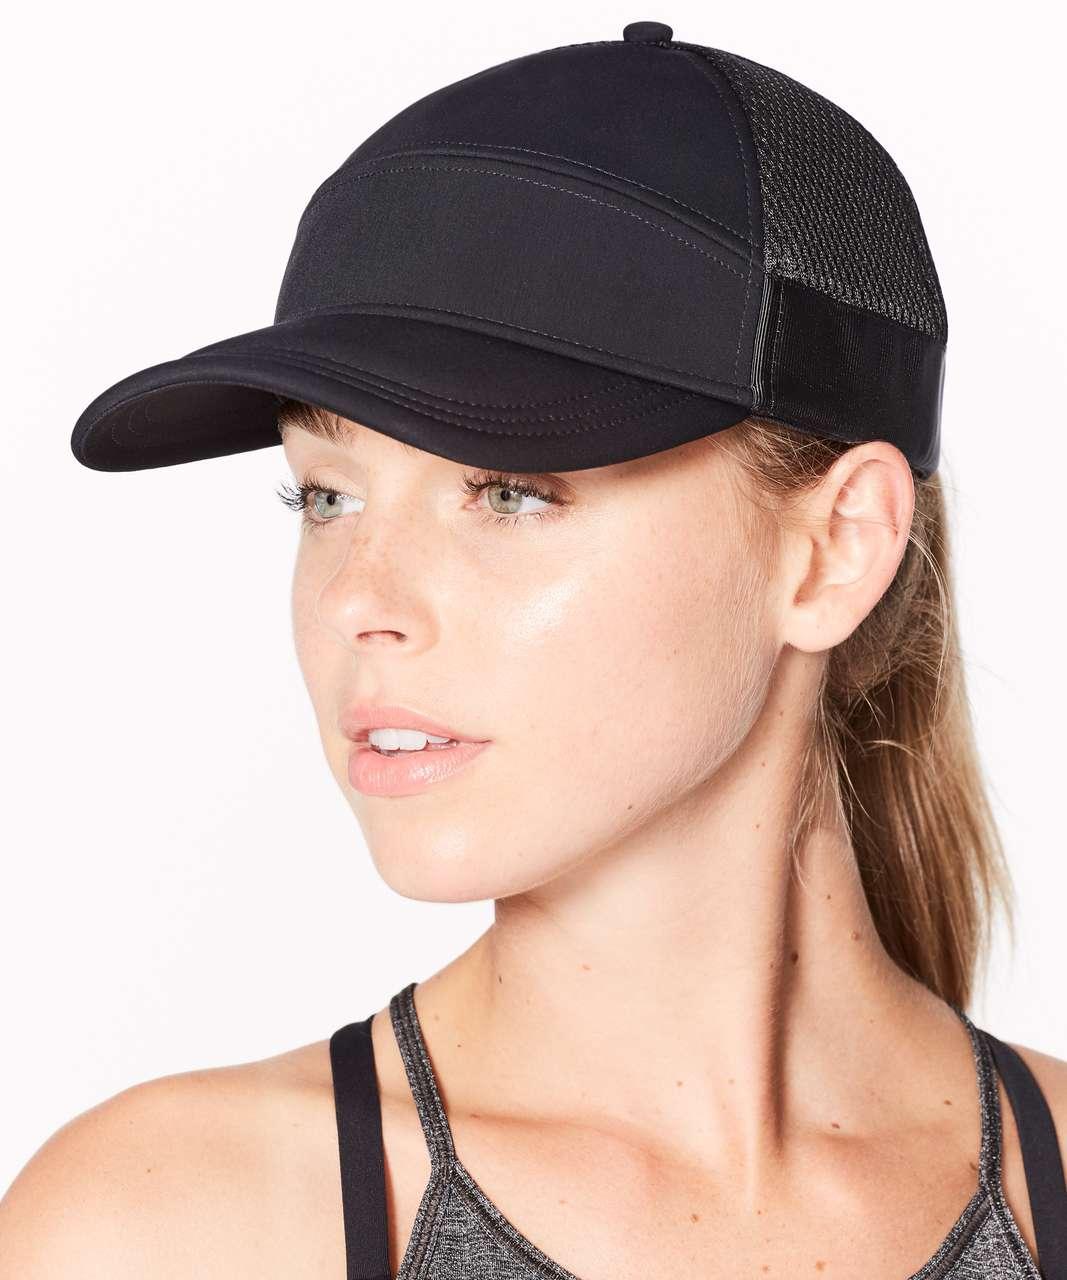 Lululemon Dash & Splash Cap - Black